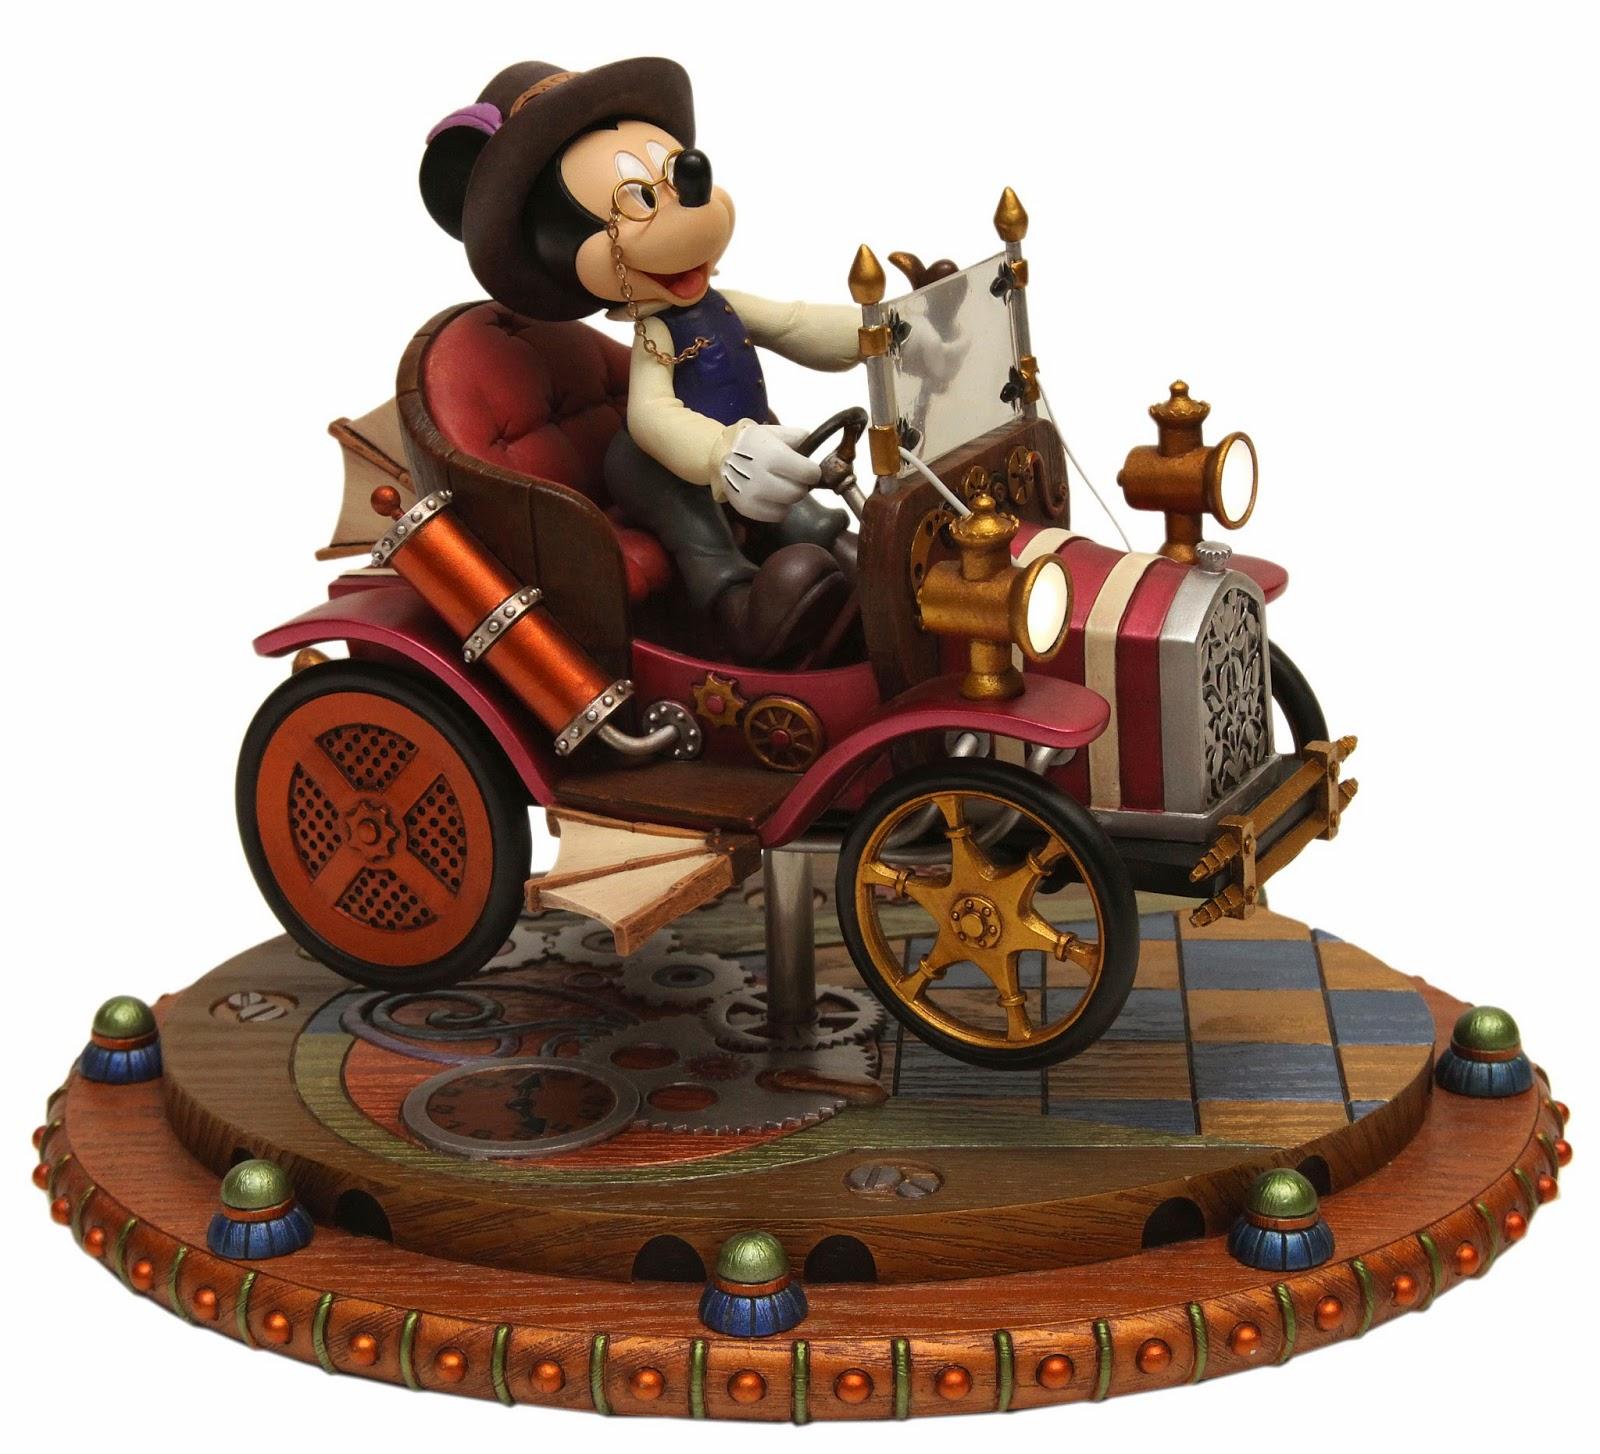 Mickey Mouse Mechanical Kingdom car roadster steampunk figure figurine sculpture gears walt disney world wdw disneyland